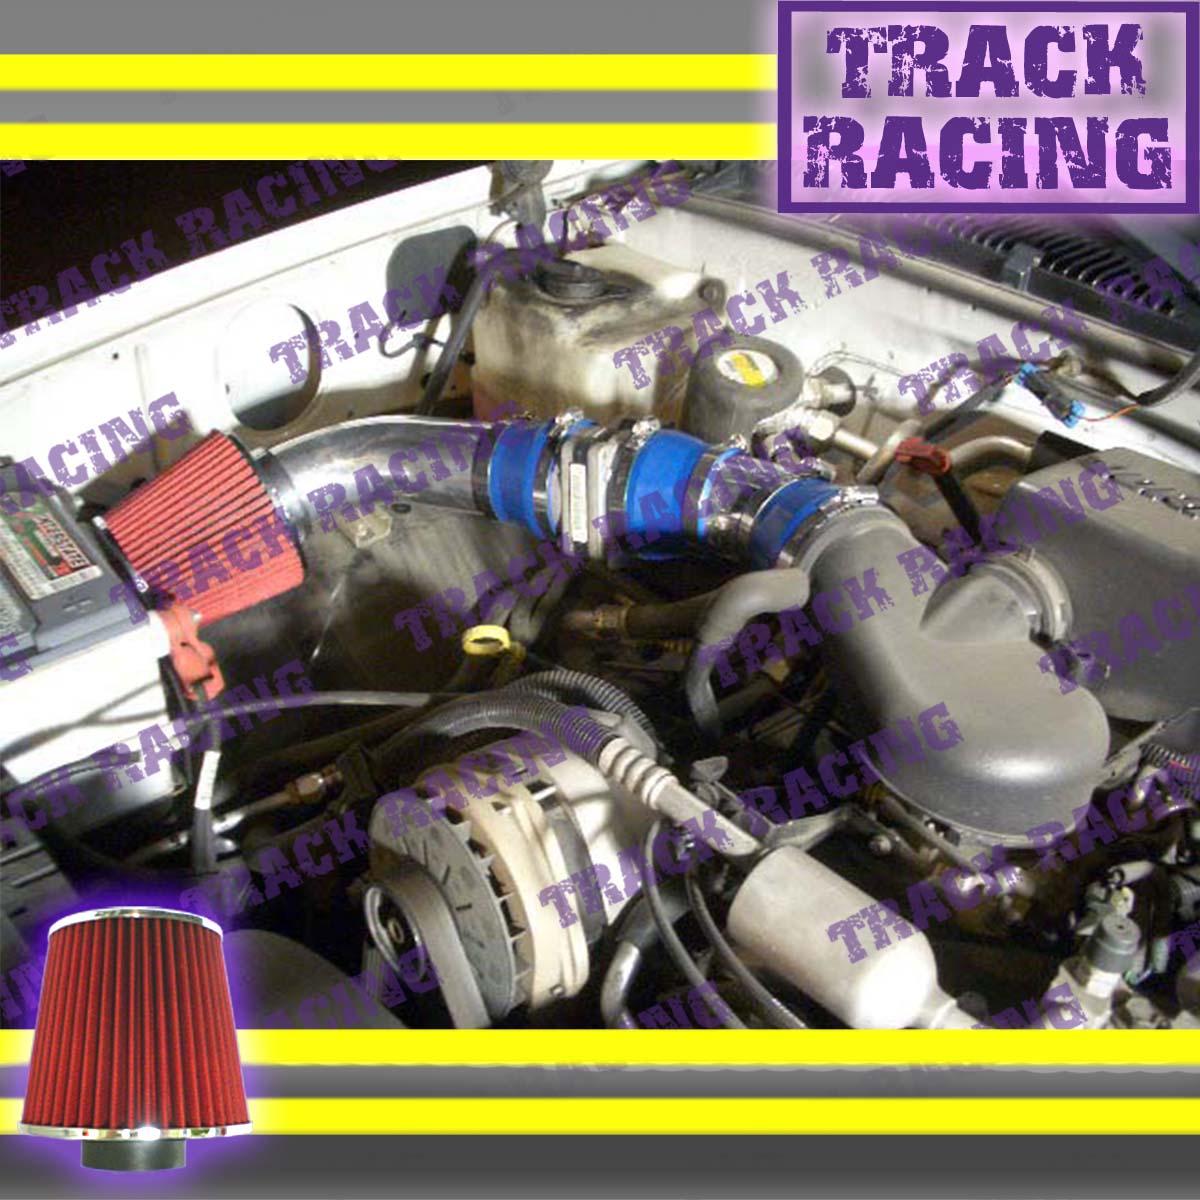 96-00 GMC CHEVY CADILLAC SUV TRUCK 5.0L 5.7L V8 COLD AIR INTAKE KIT Blue 2P